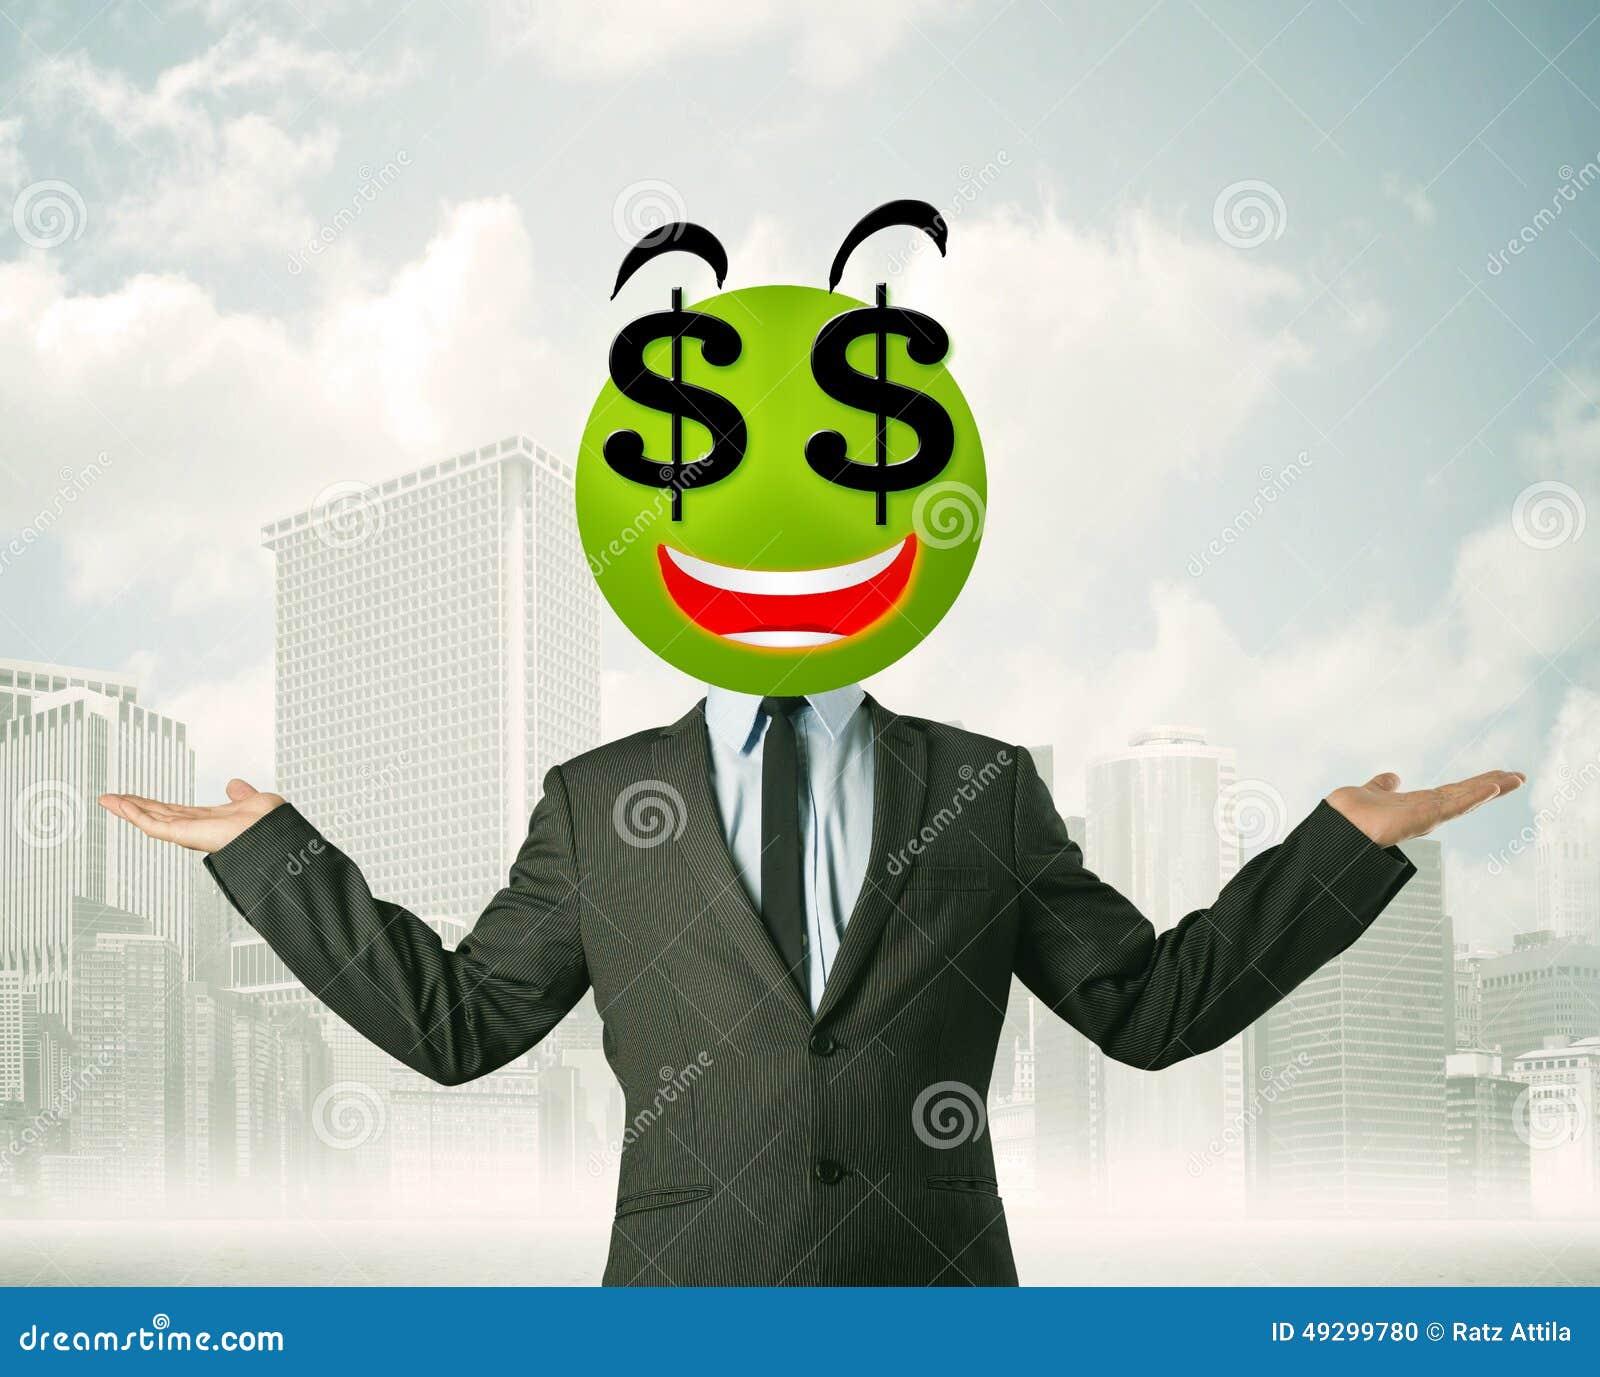 смайлик доллар: